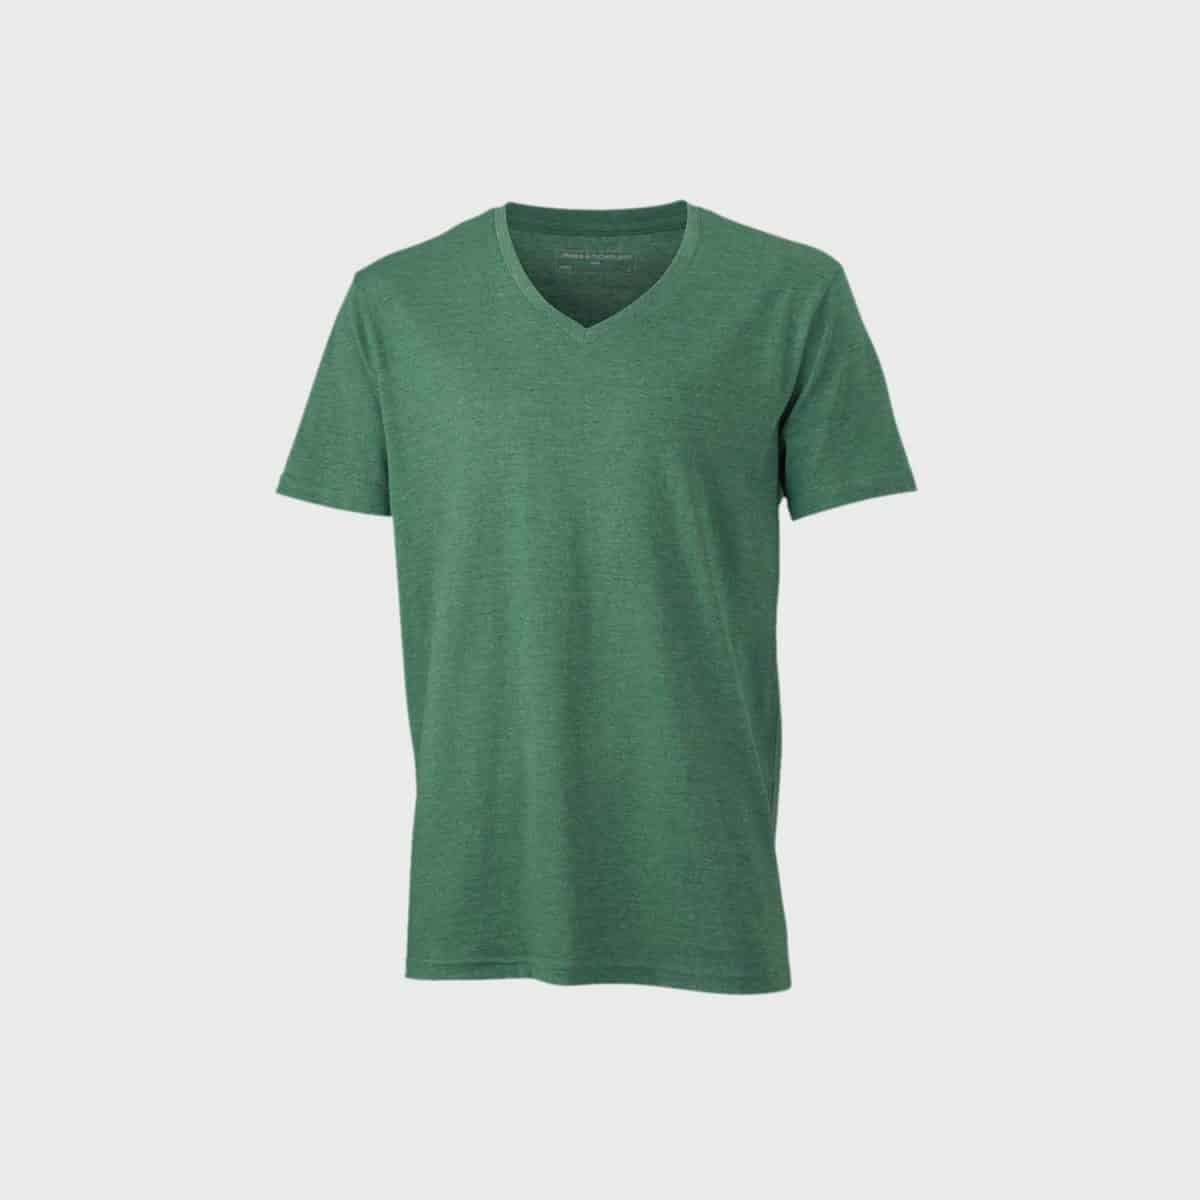 Daiber T Shirts JN974 Greenmelange Front